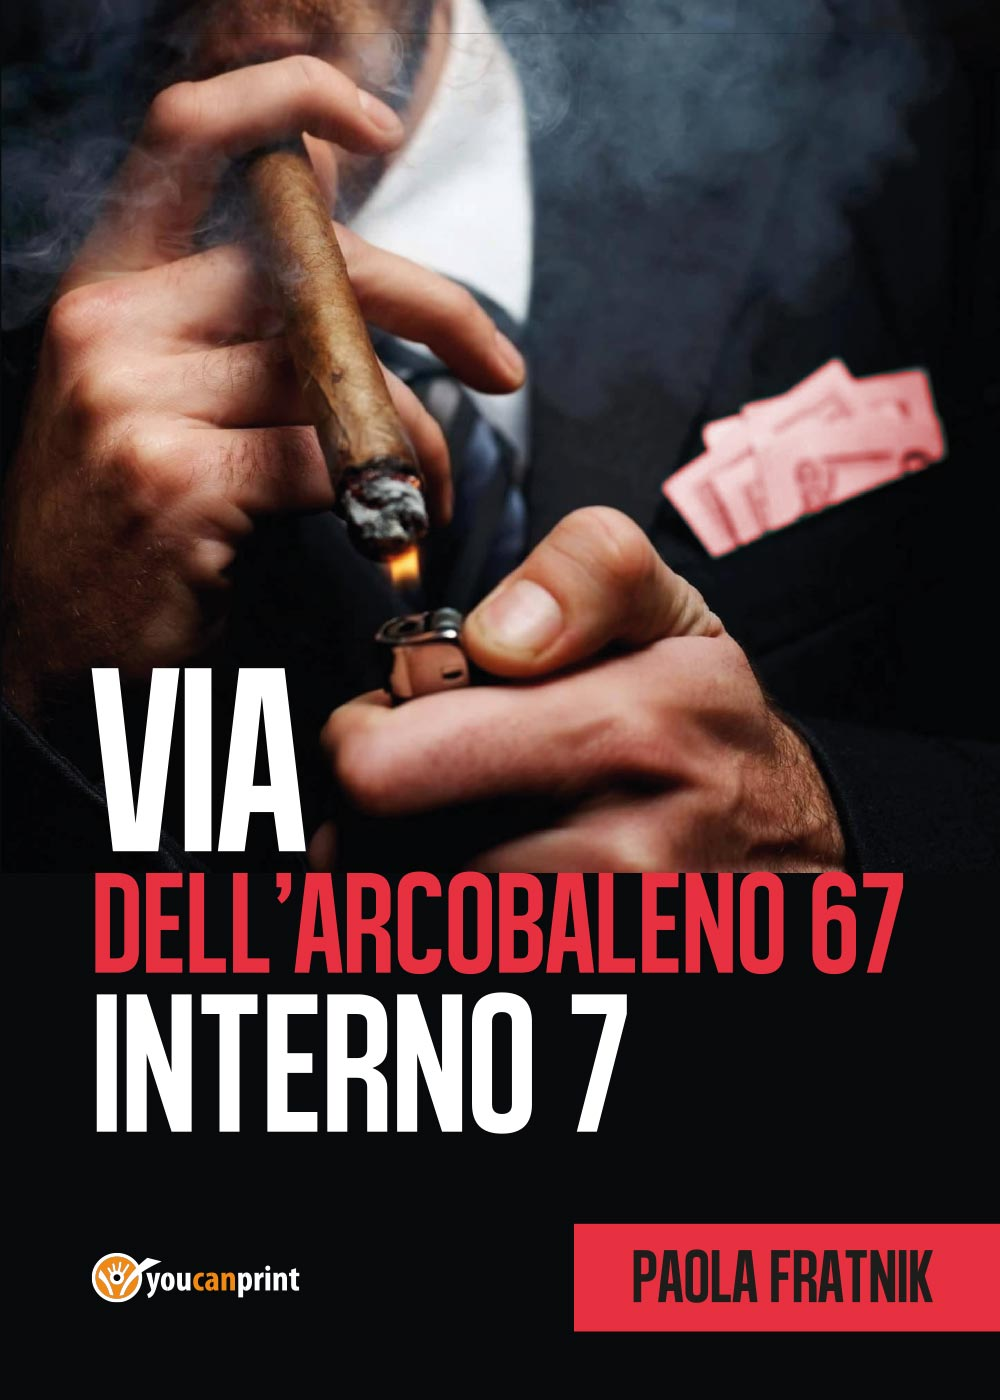 Via Dell'Arcobaleno 67 - Interno 7 paola fratnik